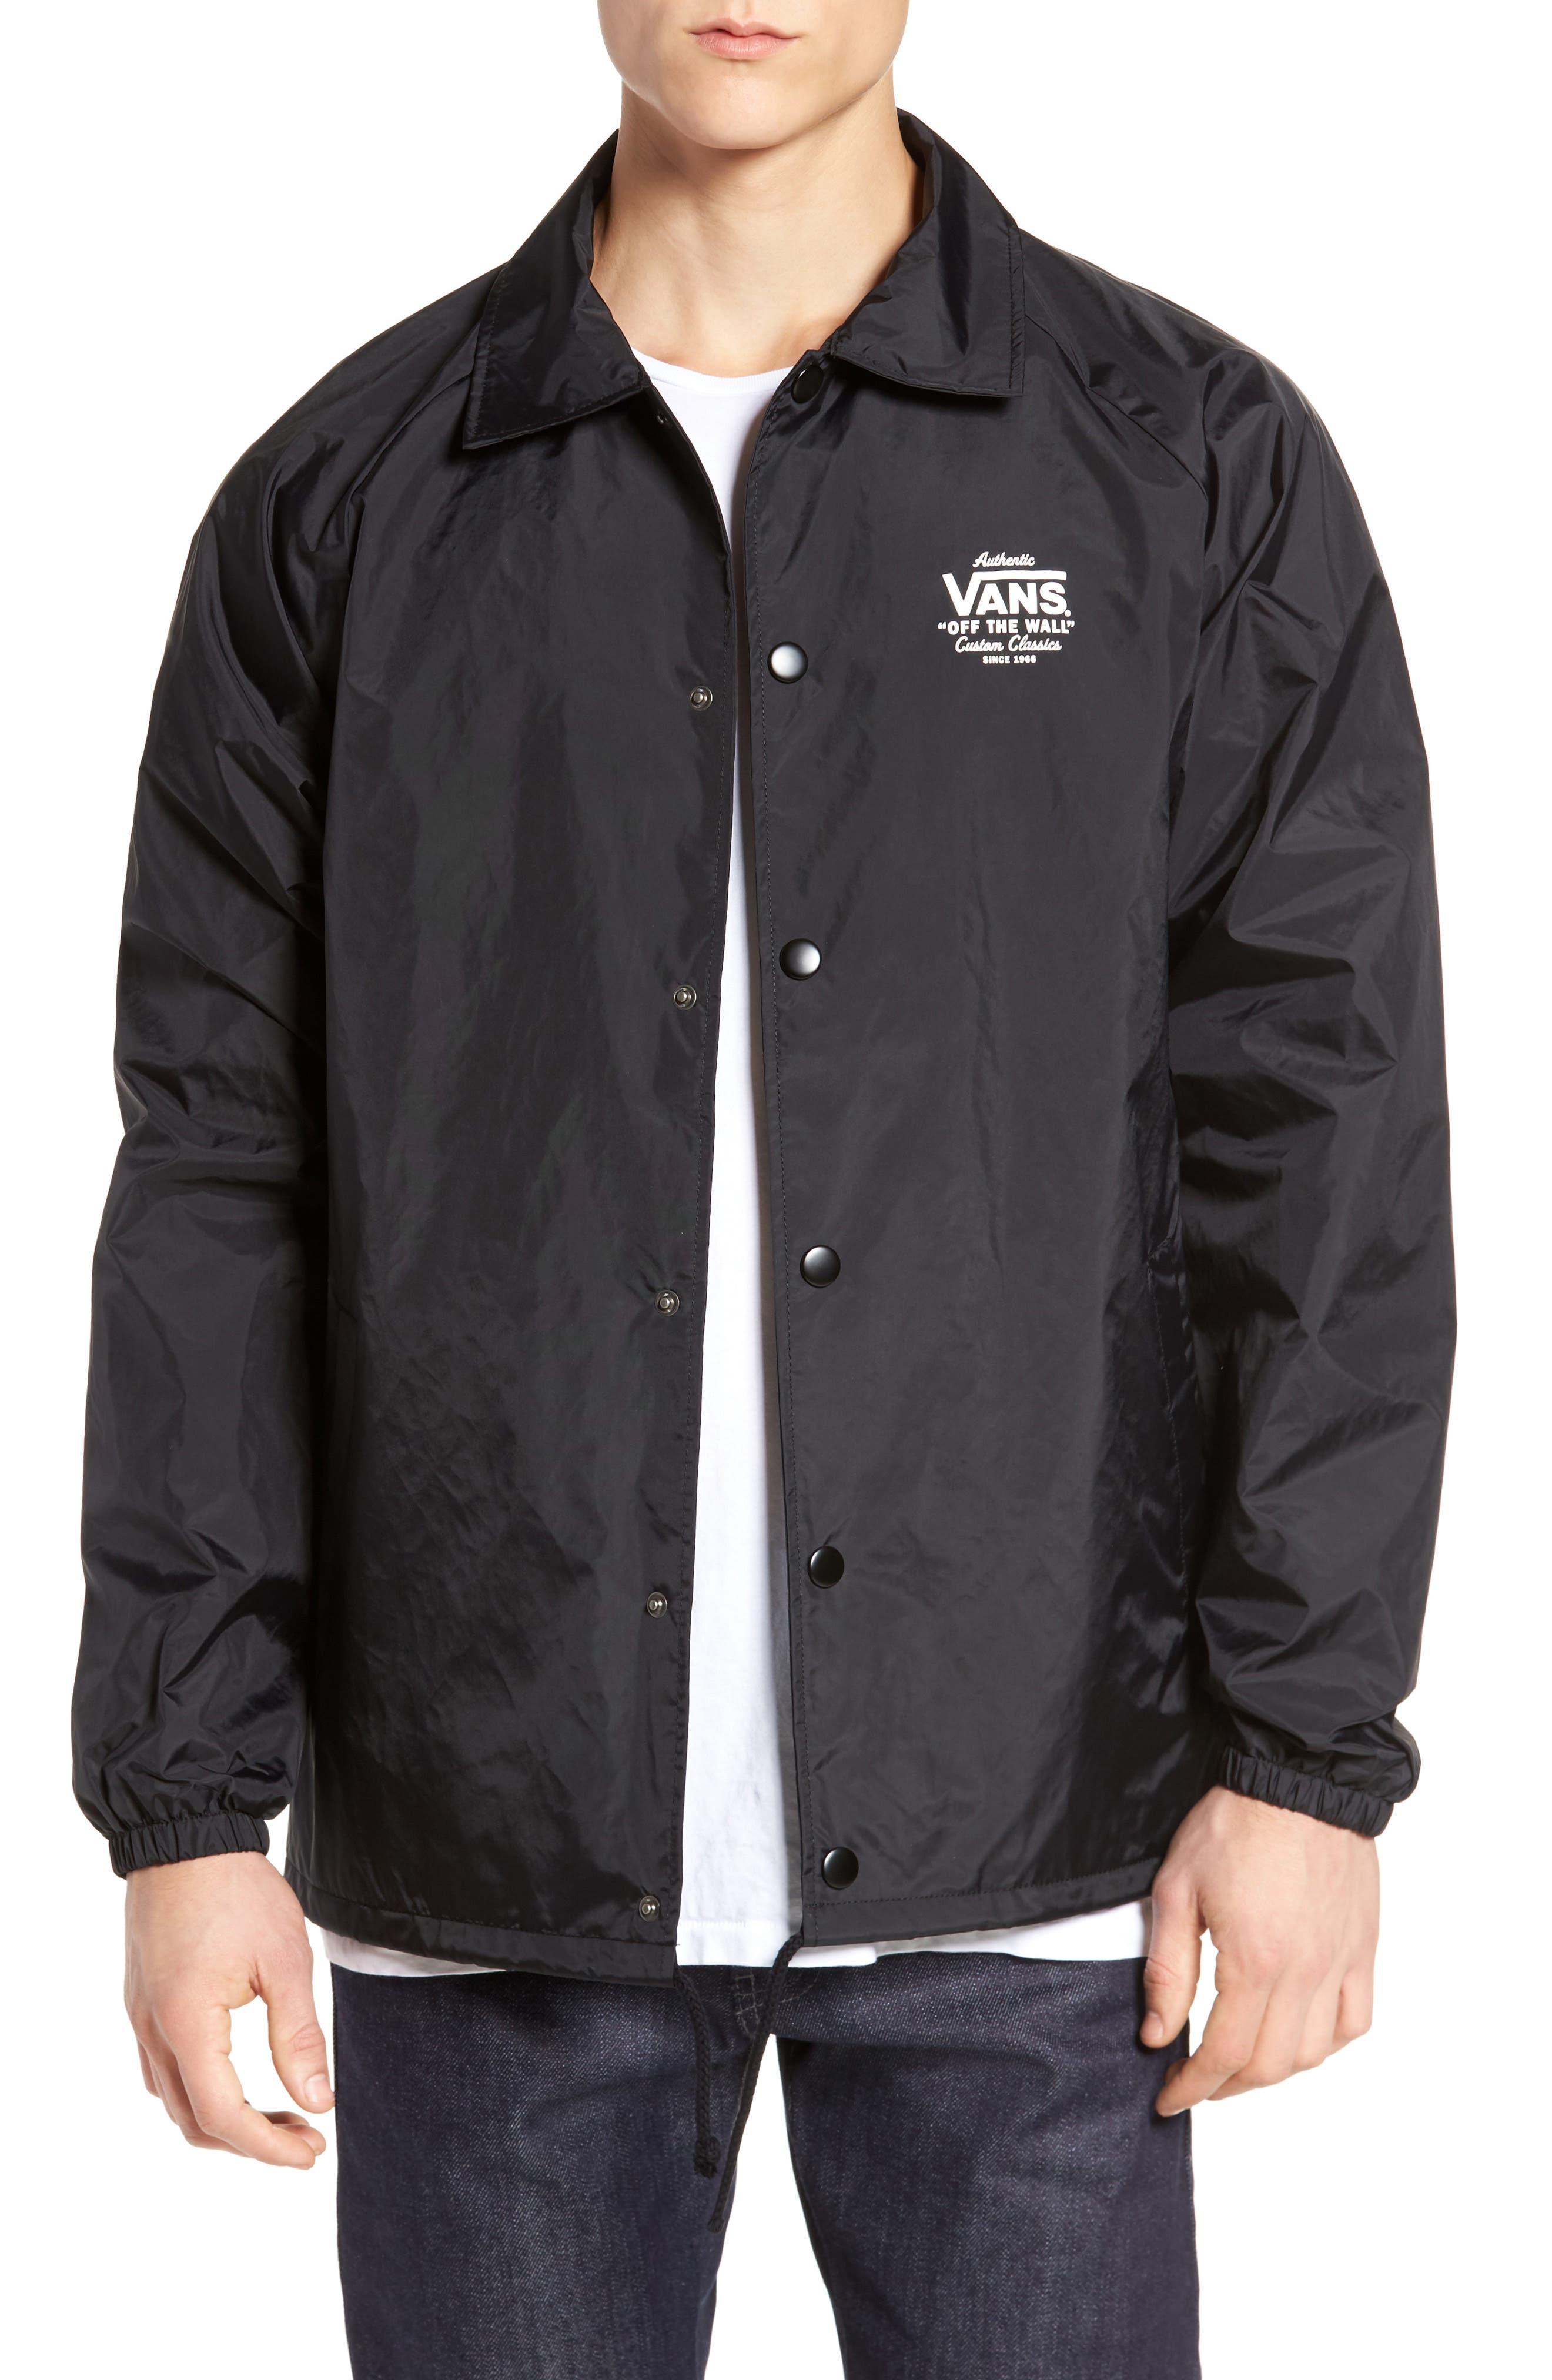 Main Image - Vans Torrey Water Resistant Jacket